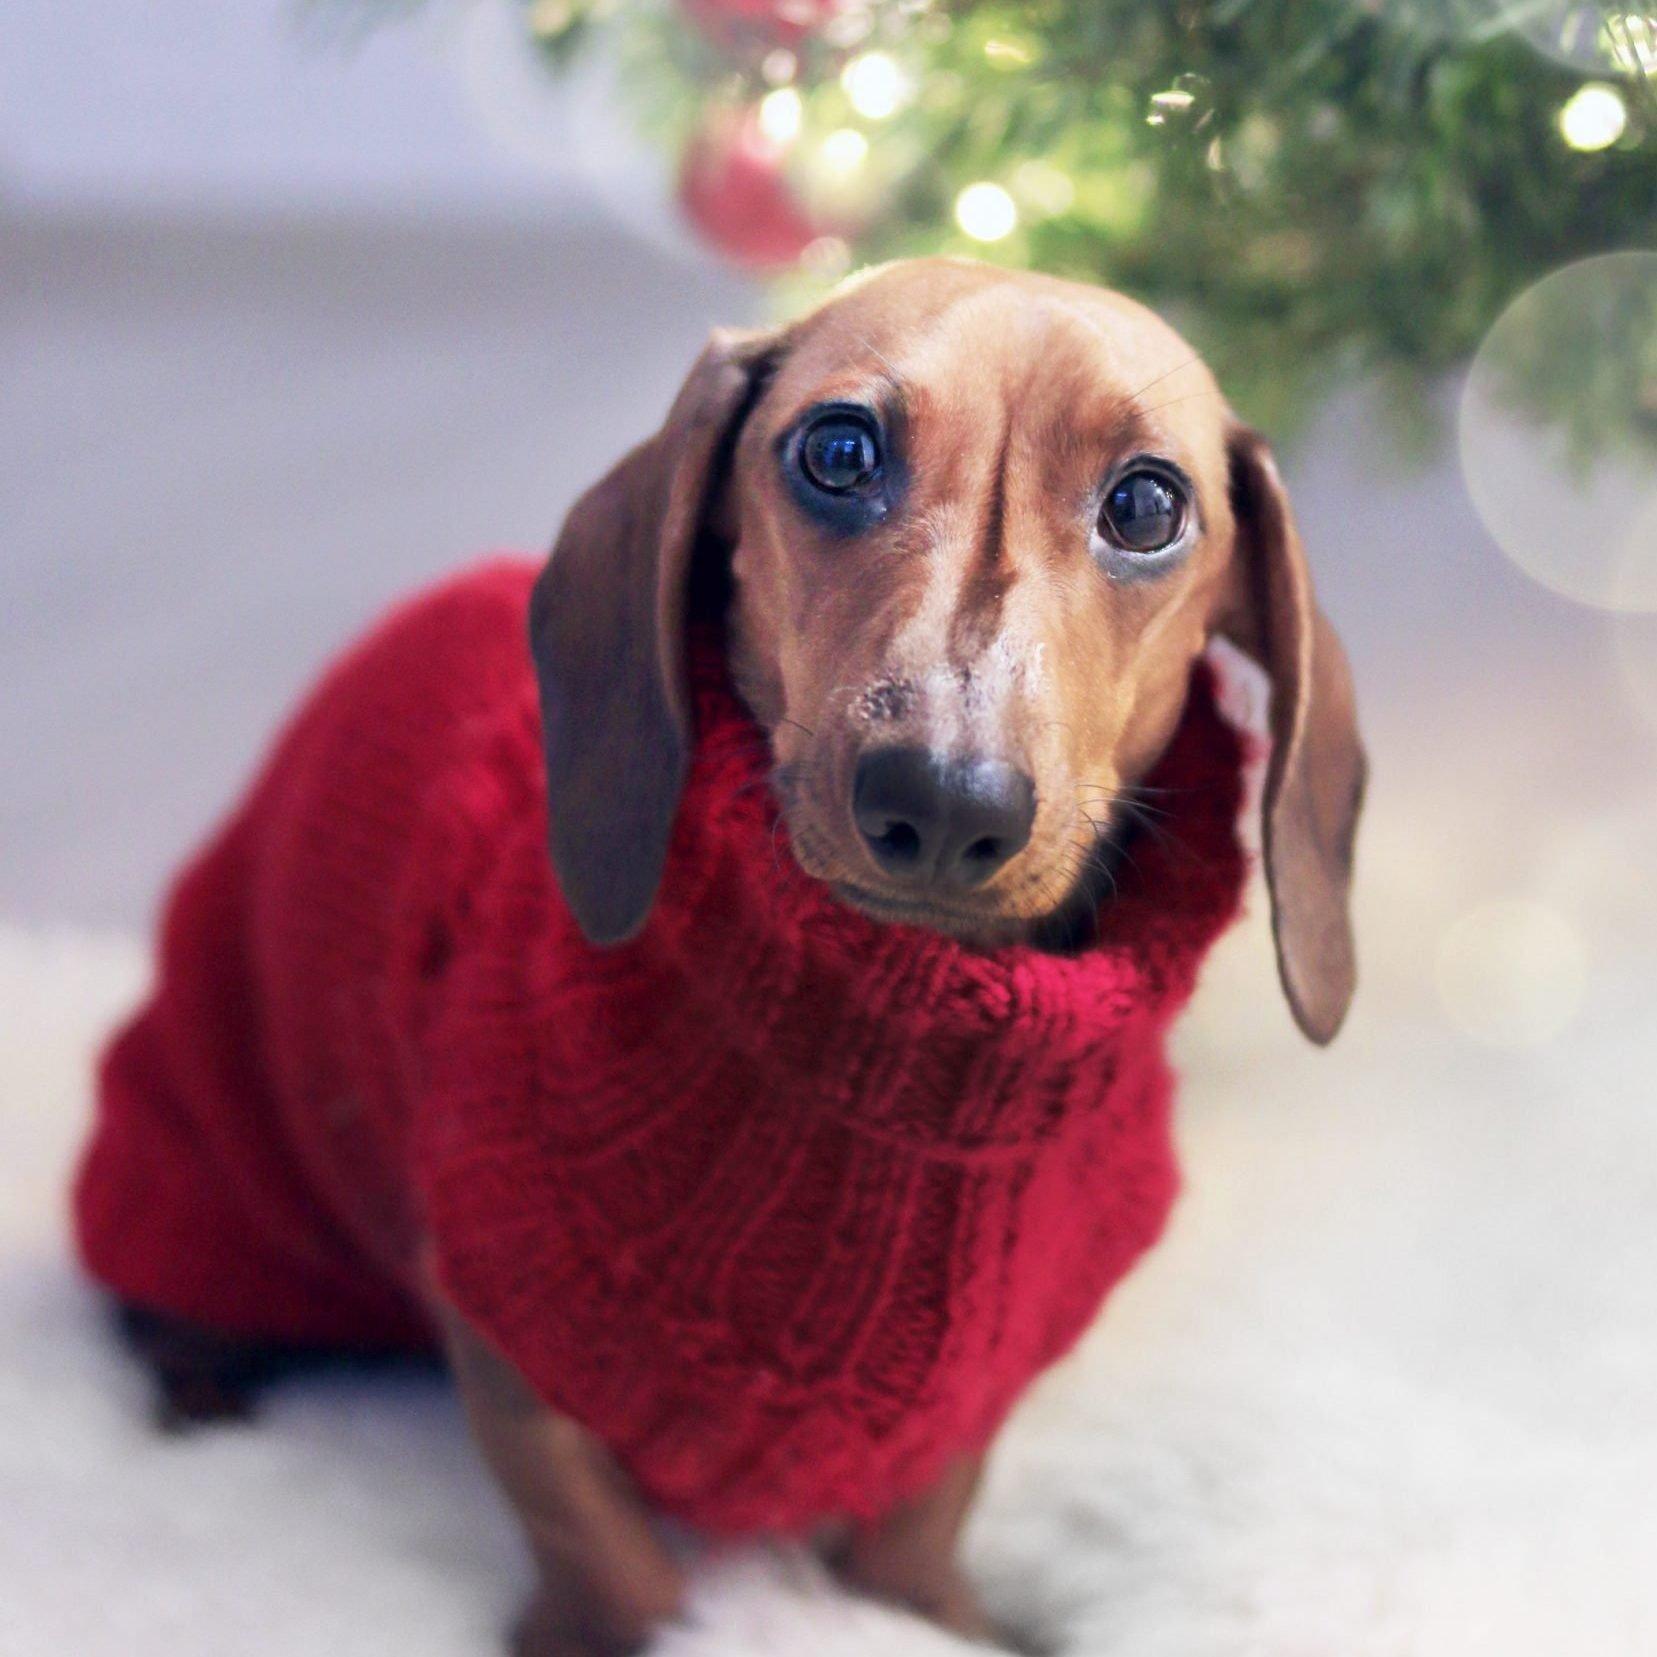 dachshund wearing sweater